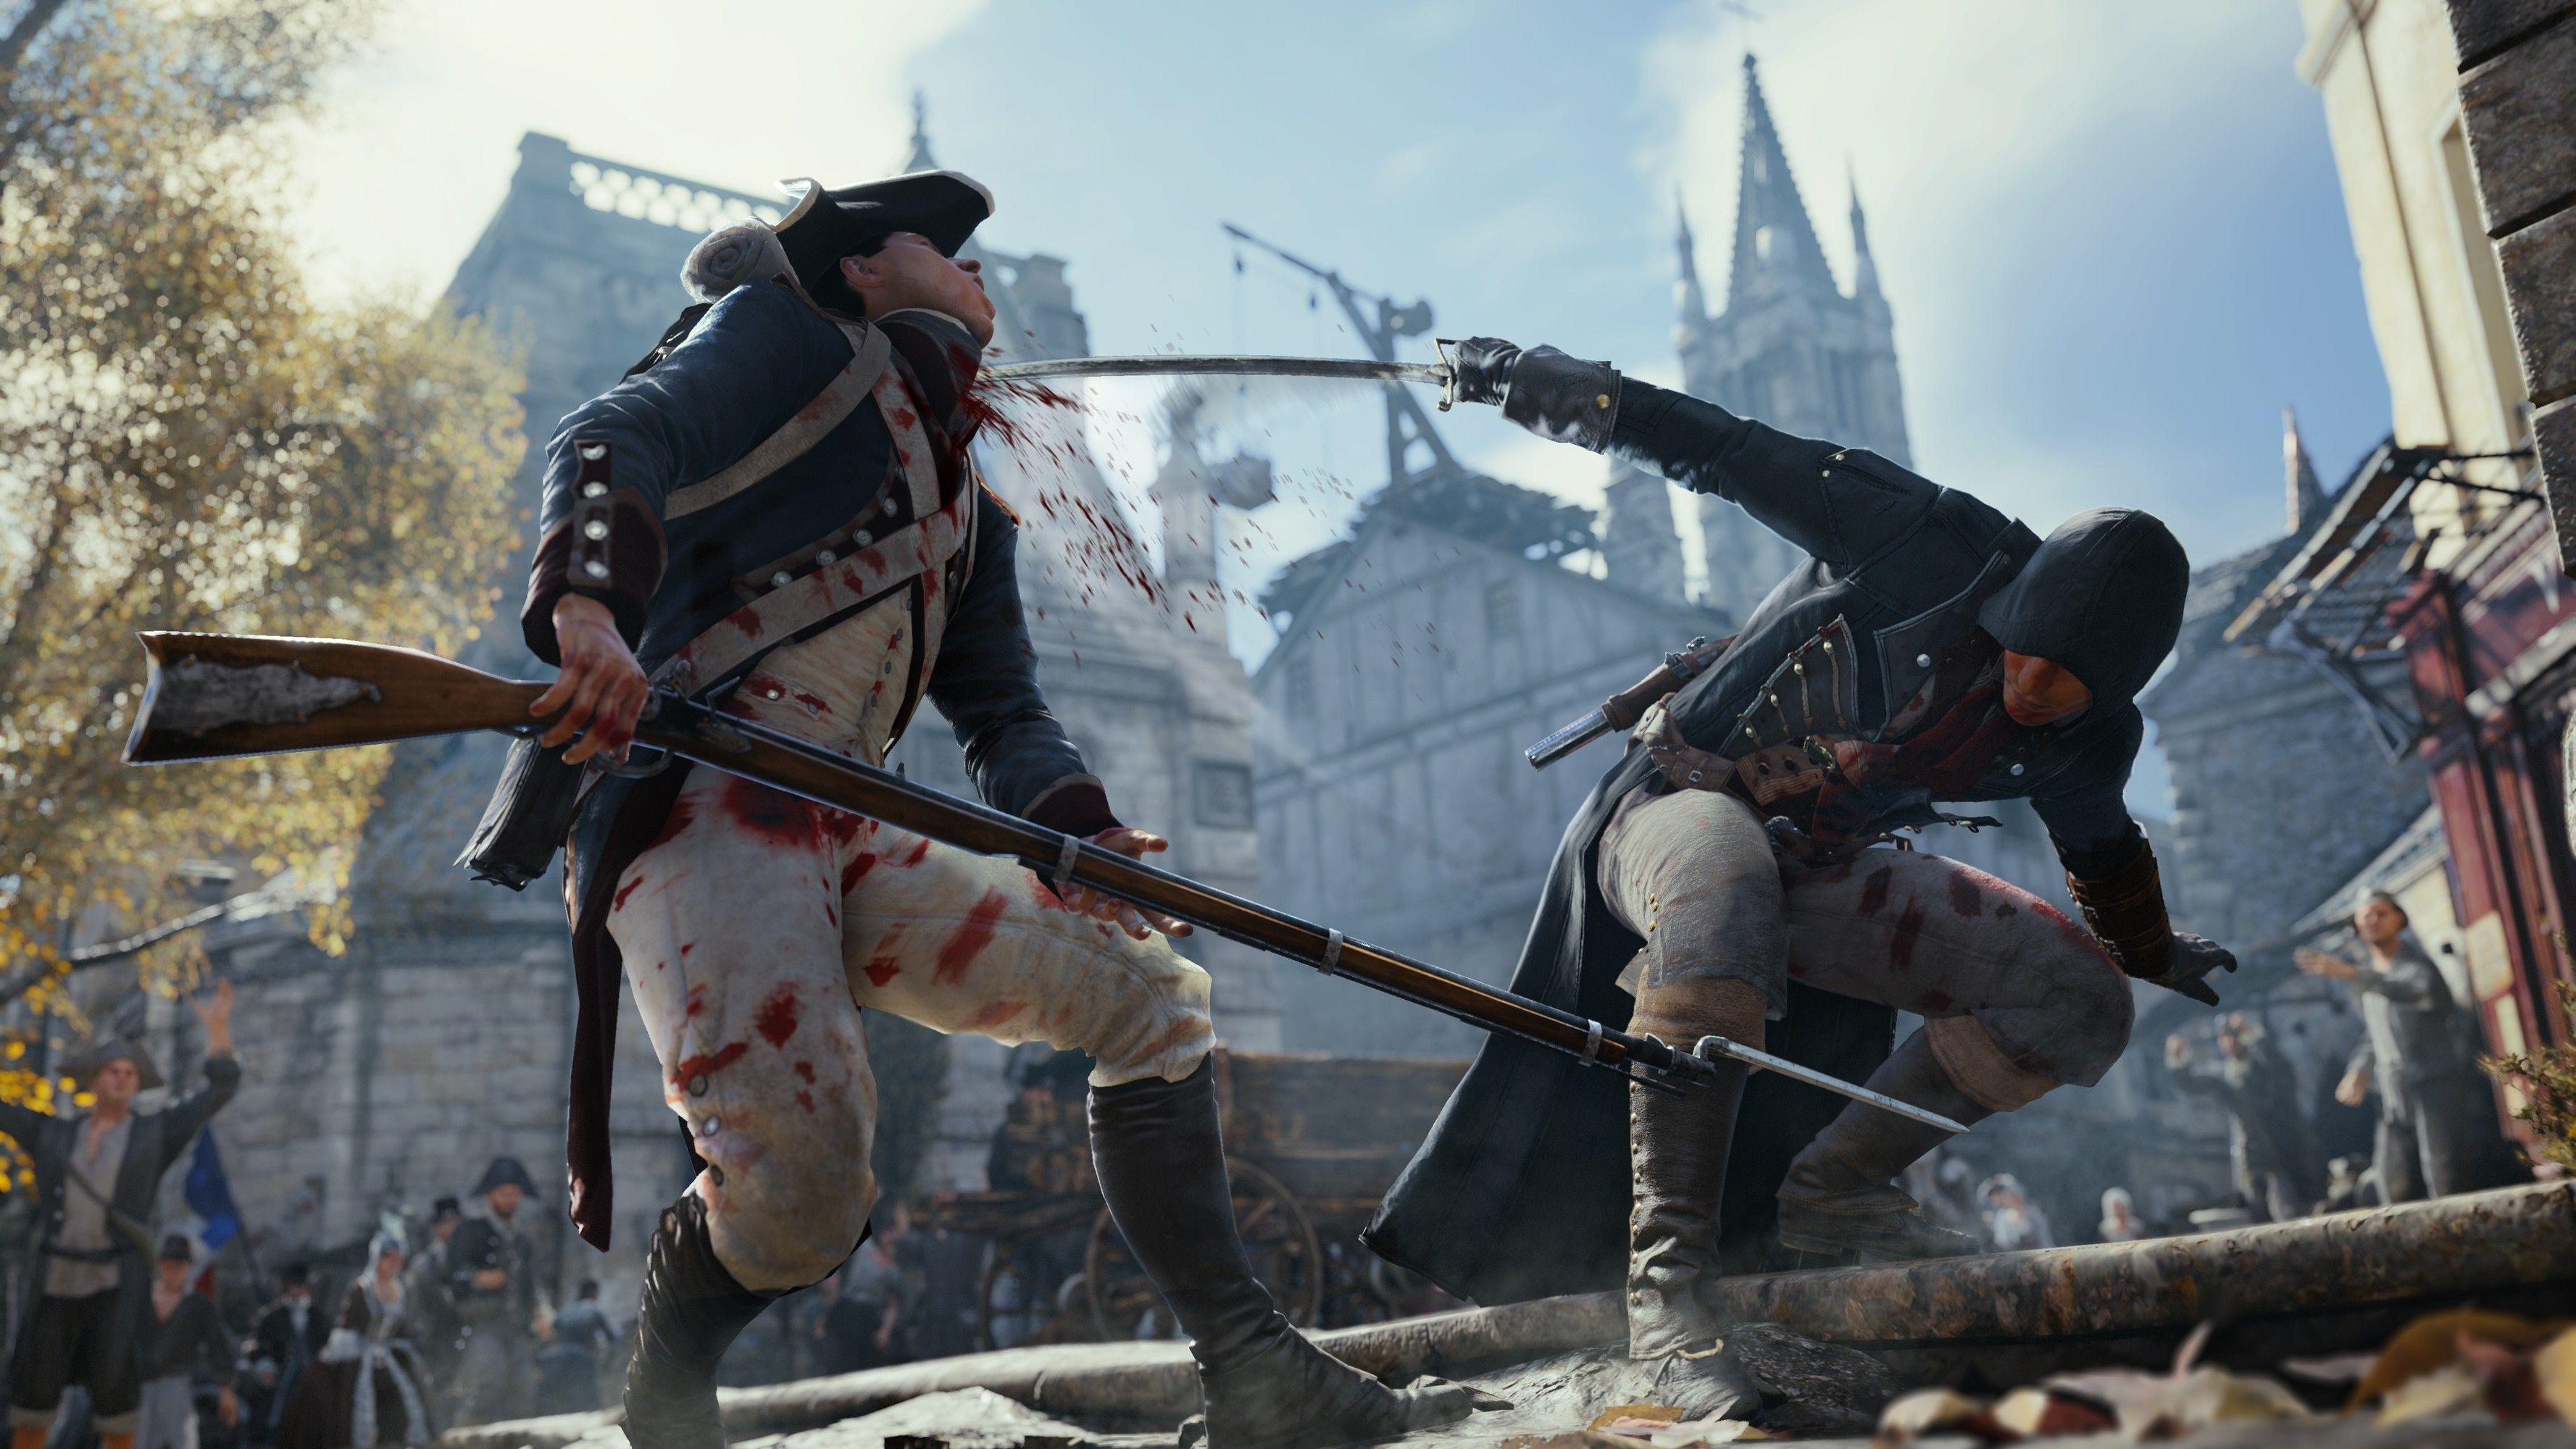 Assassin's Creed Unity (PC) - 10